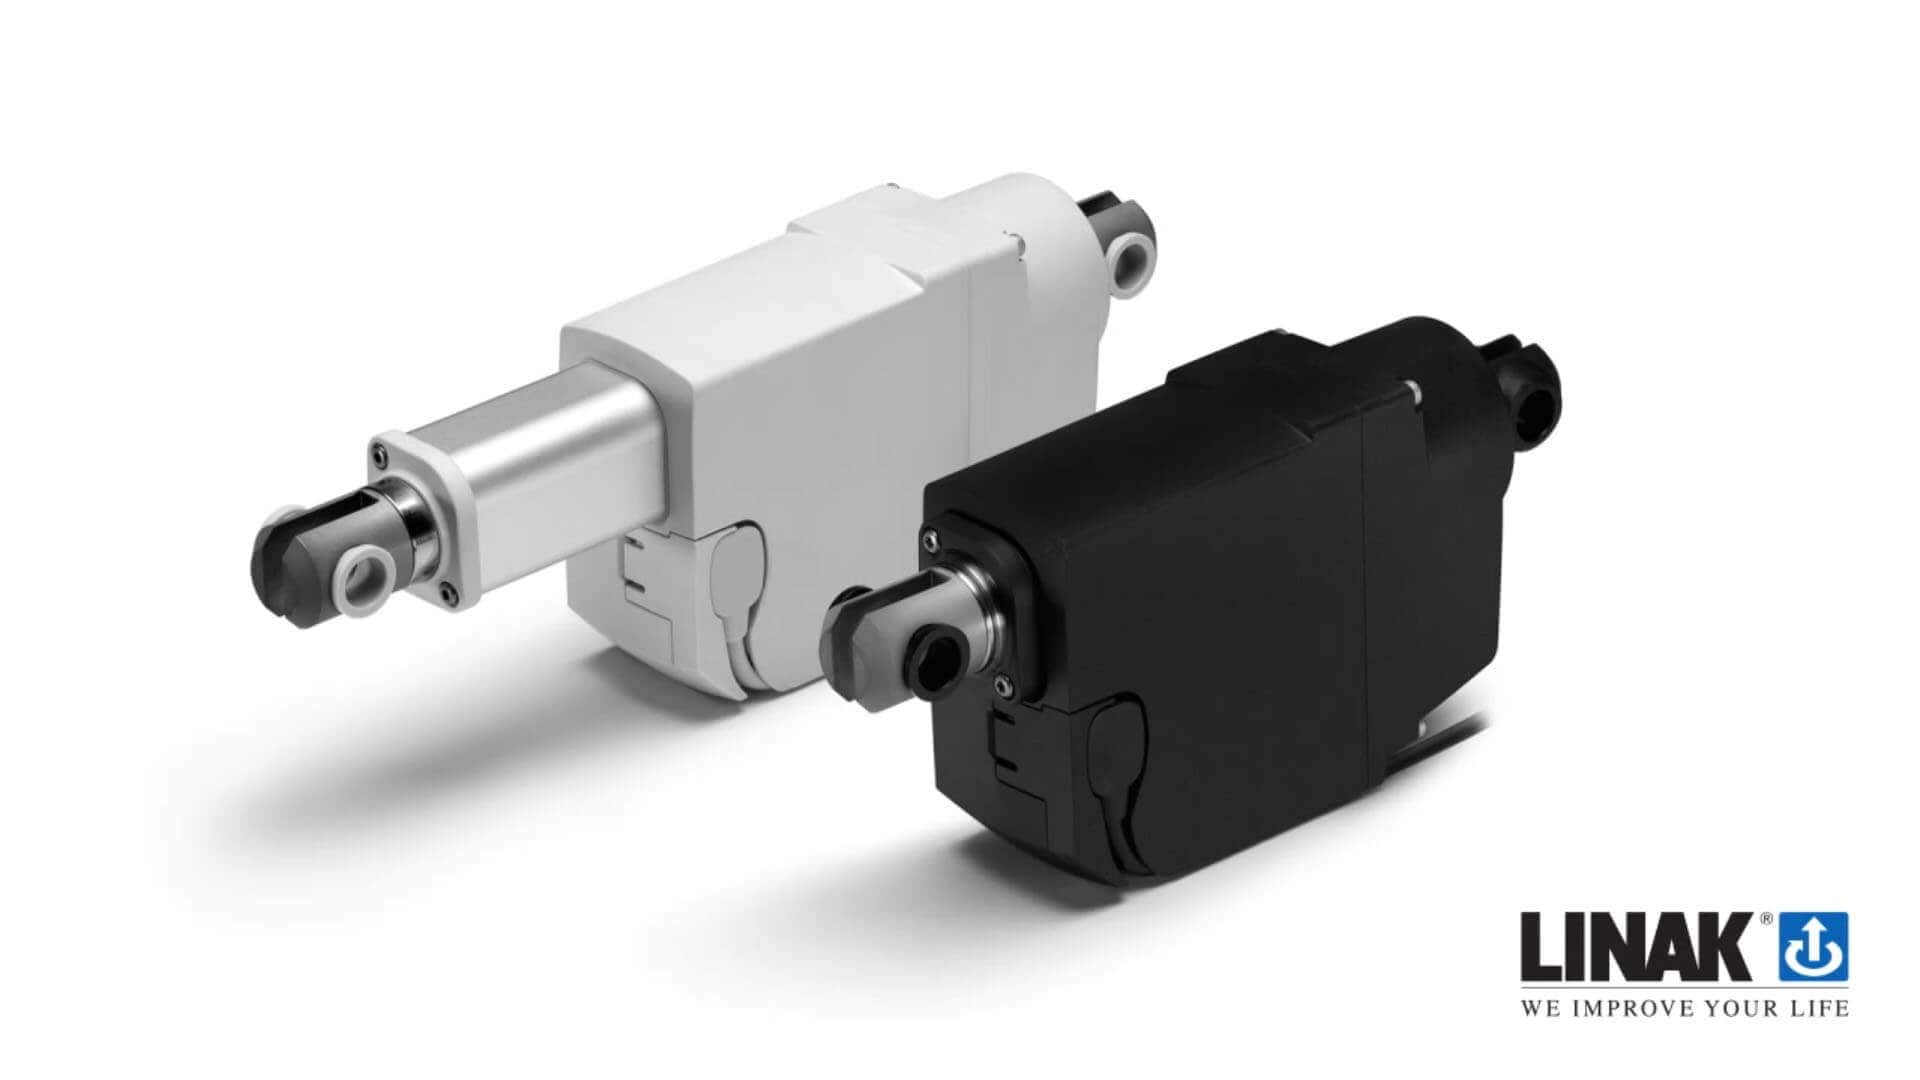 Linak Linear Actuator Wiring Diagram Circuit Diagram Symbols \u2022 12 Volt  Trolling Motor Wiring 12 Volt Actuator Wiring Diagram Schematic